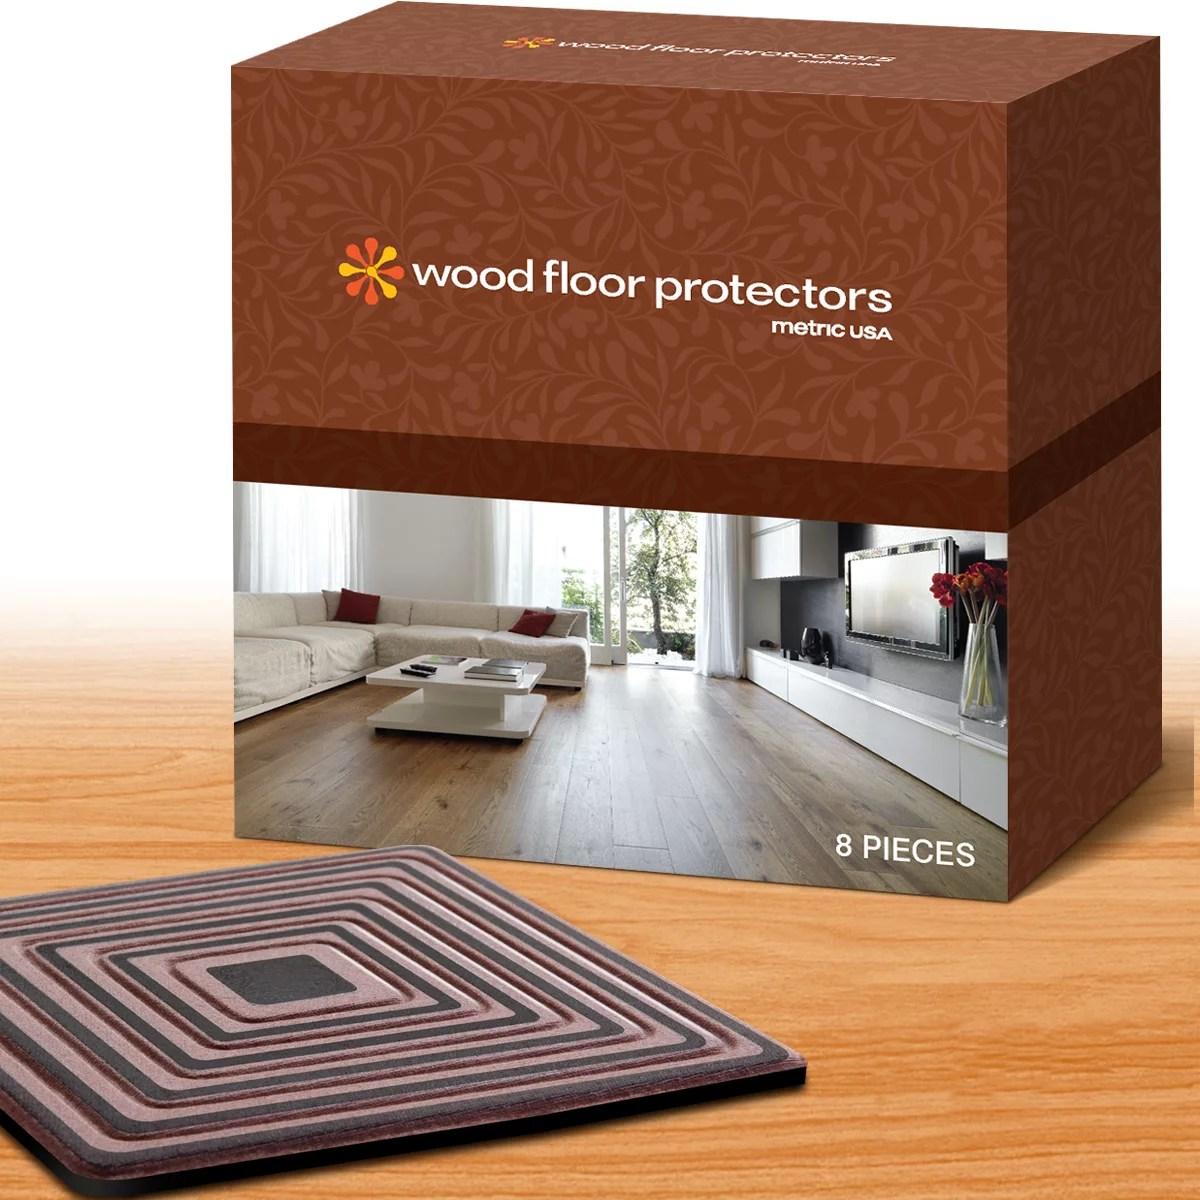 Wood Floor Protectors By Metric Usa Set Of 8 Furniture